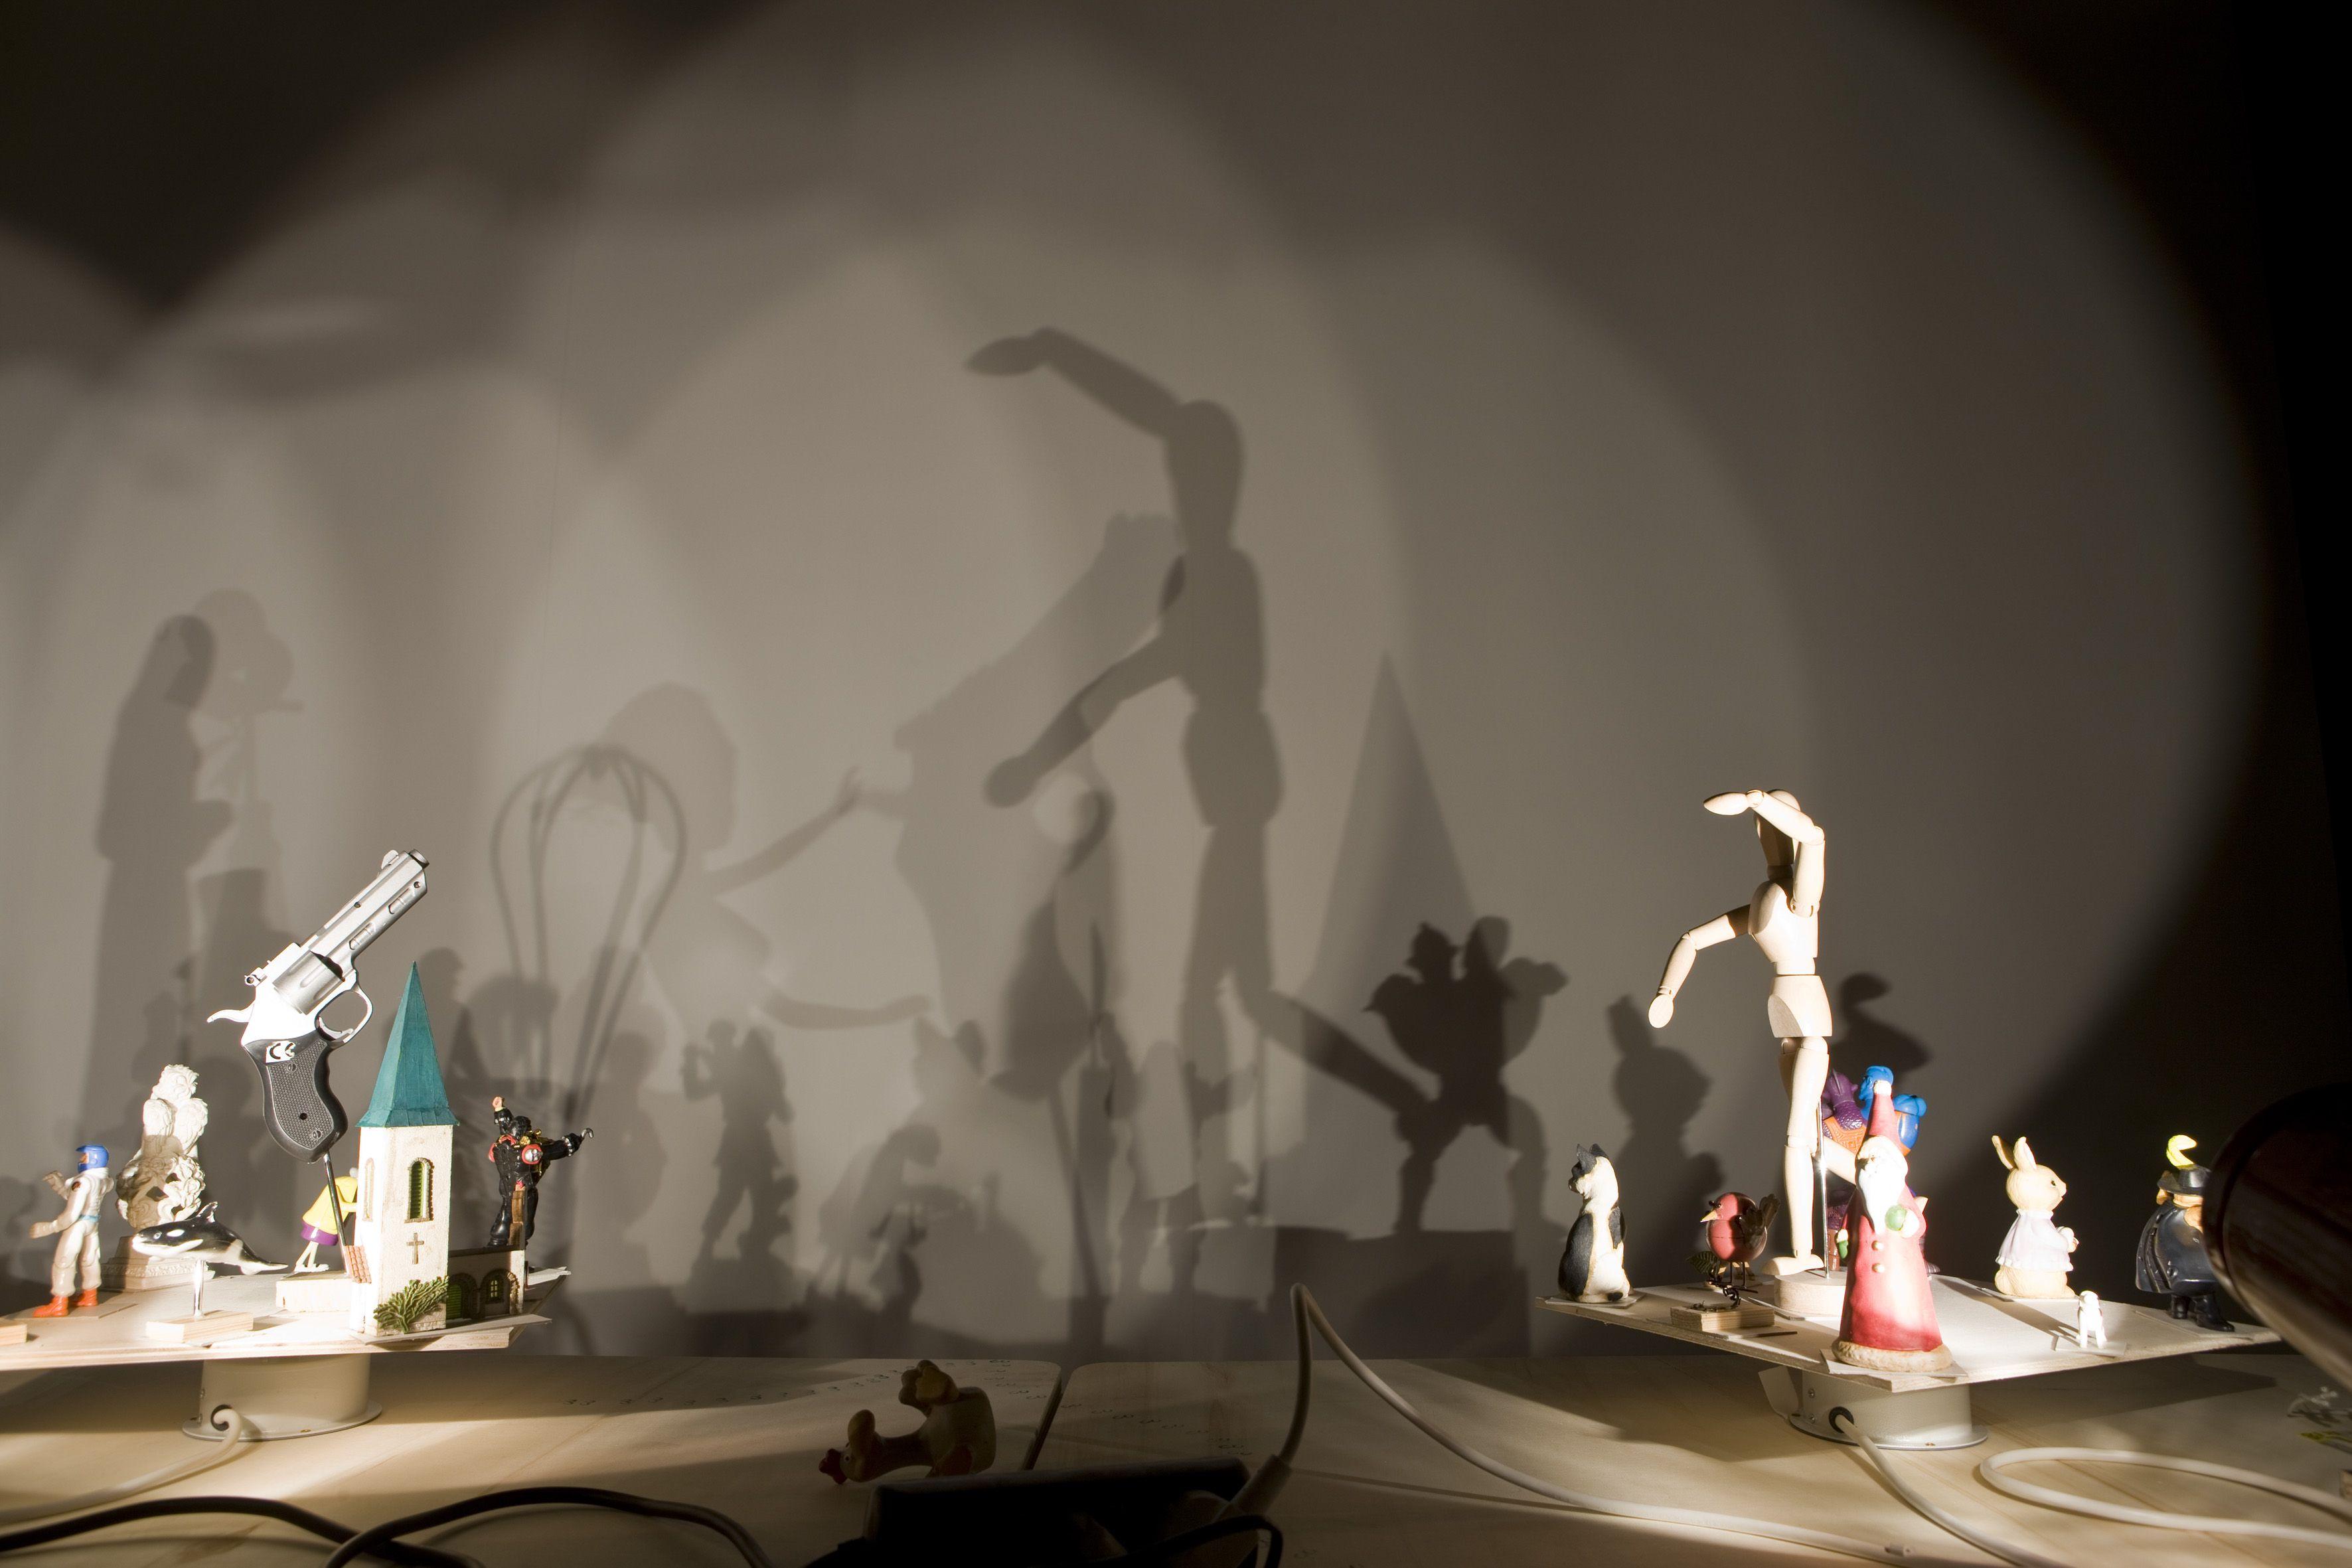 Hans-Peter Feldmann, Shadow Play, 2002-2012 Foto Agostino Osio Courtesy Fondazione HangarBicocca www.hangarbicocca.org